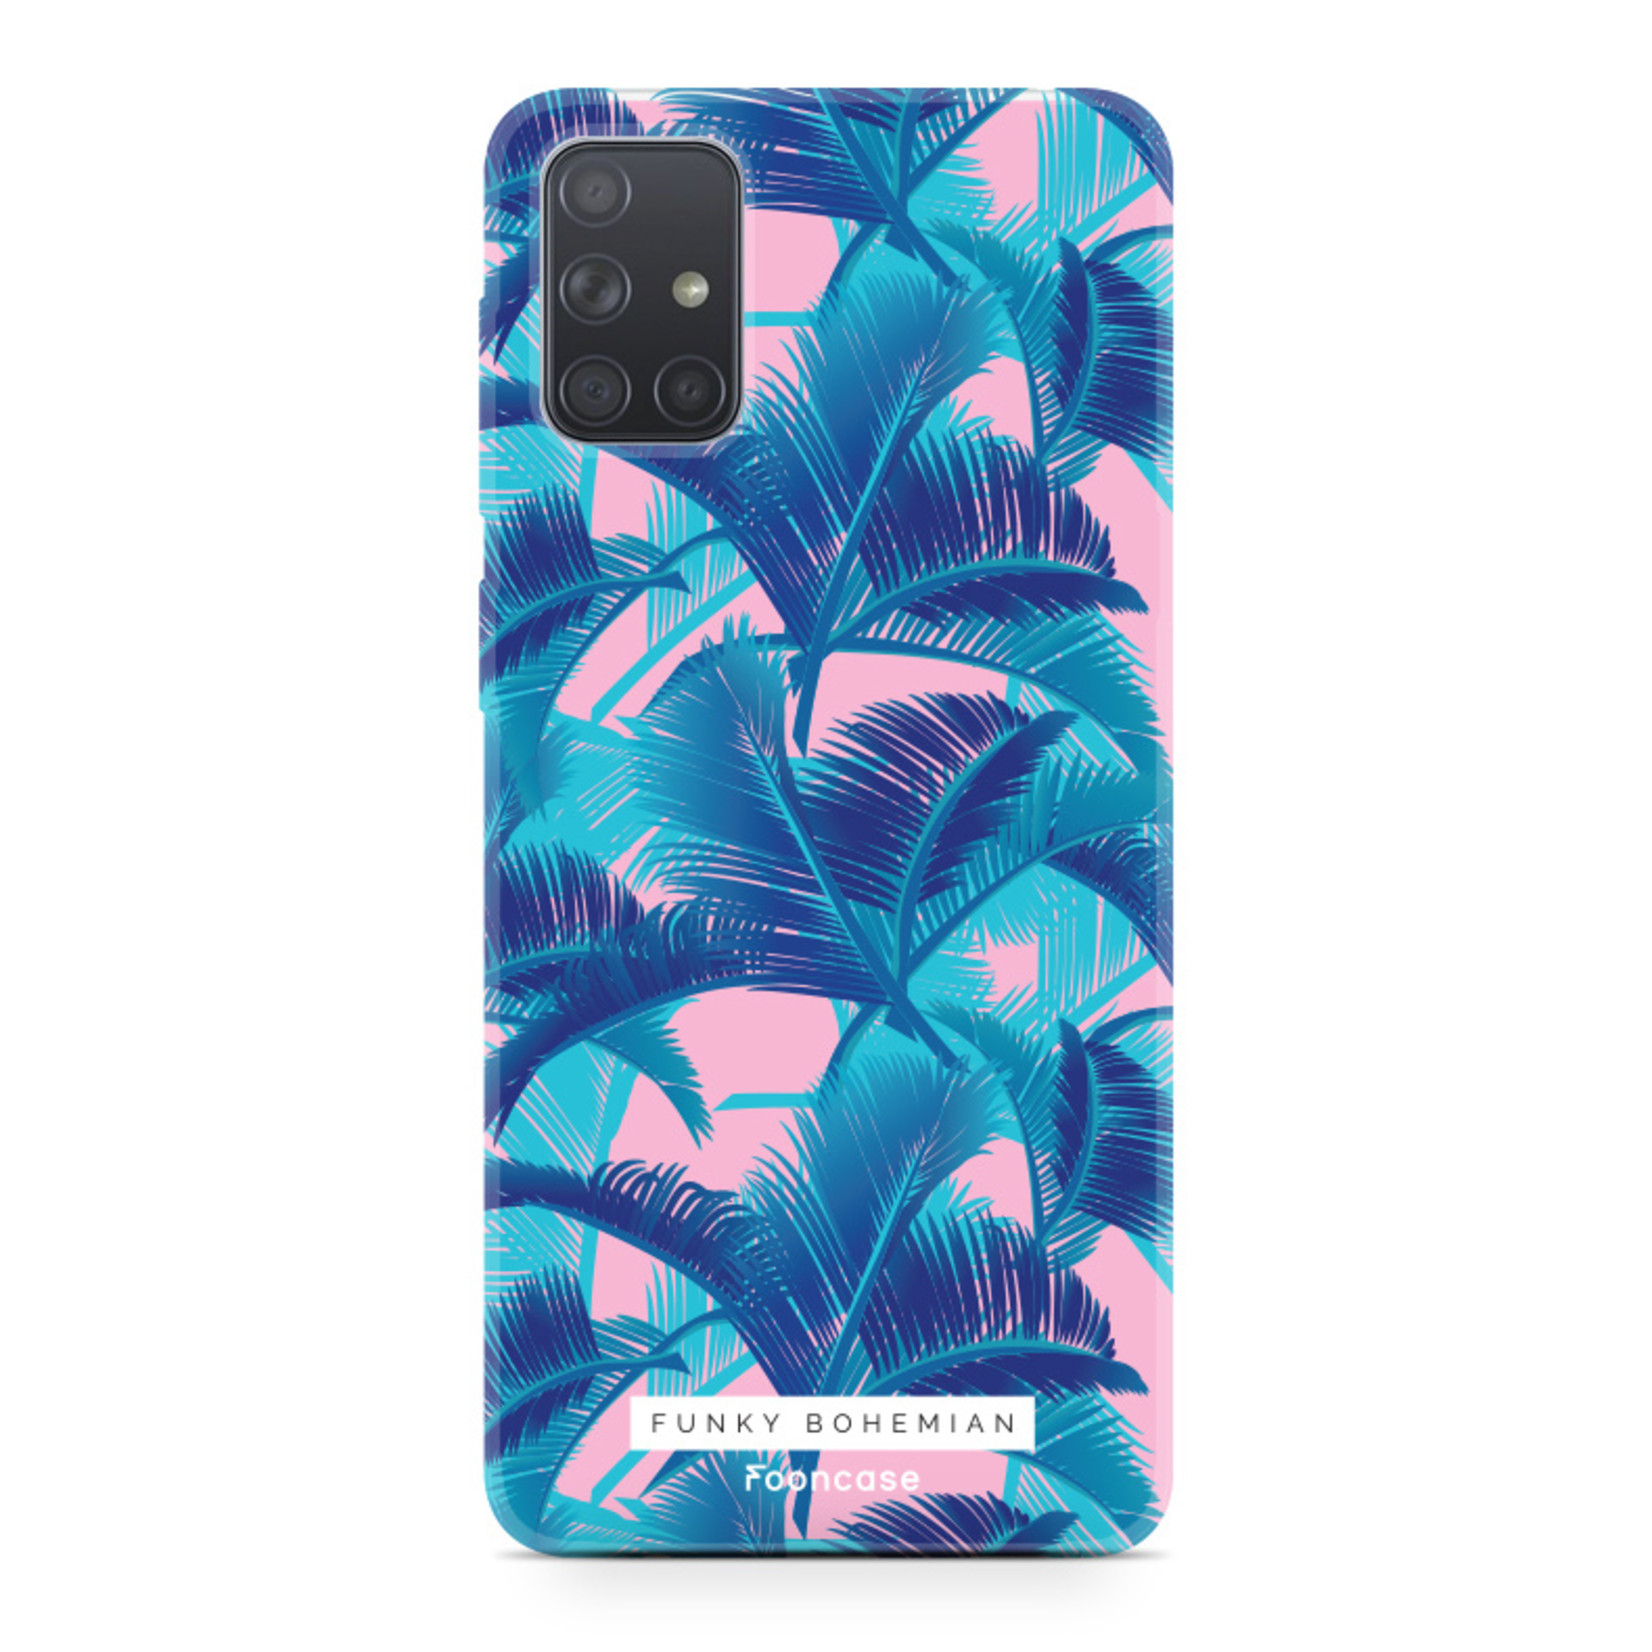 Samsung Galaxy A51 hoesje TPU Soft Case - Back Cover - Funky Bohemian / Blauw Roze Bladeren